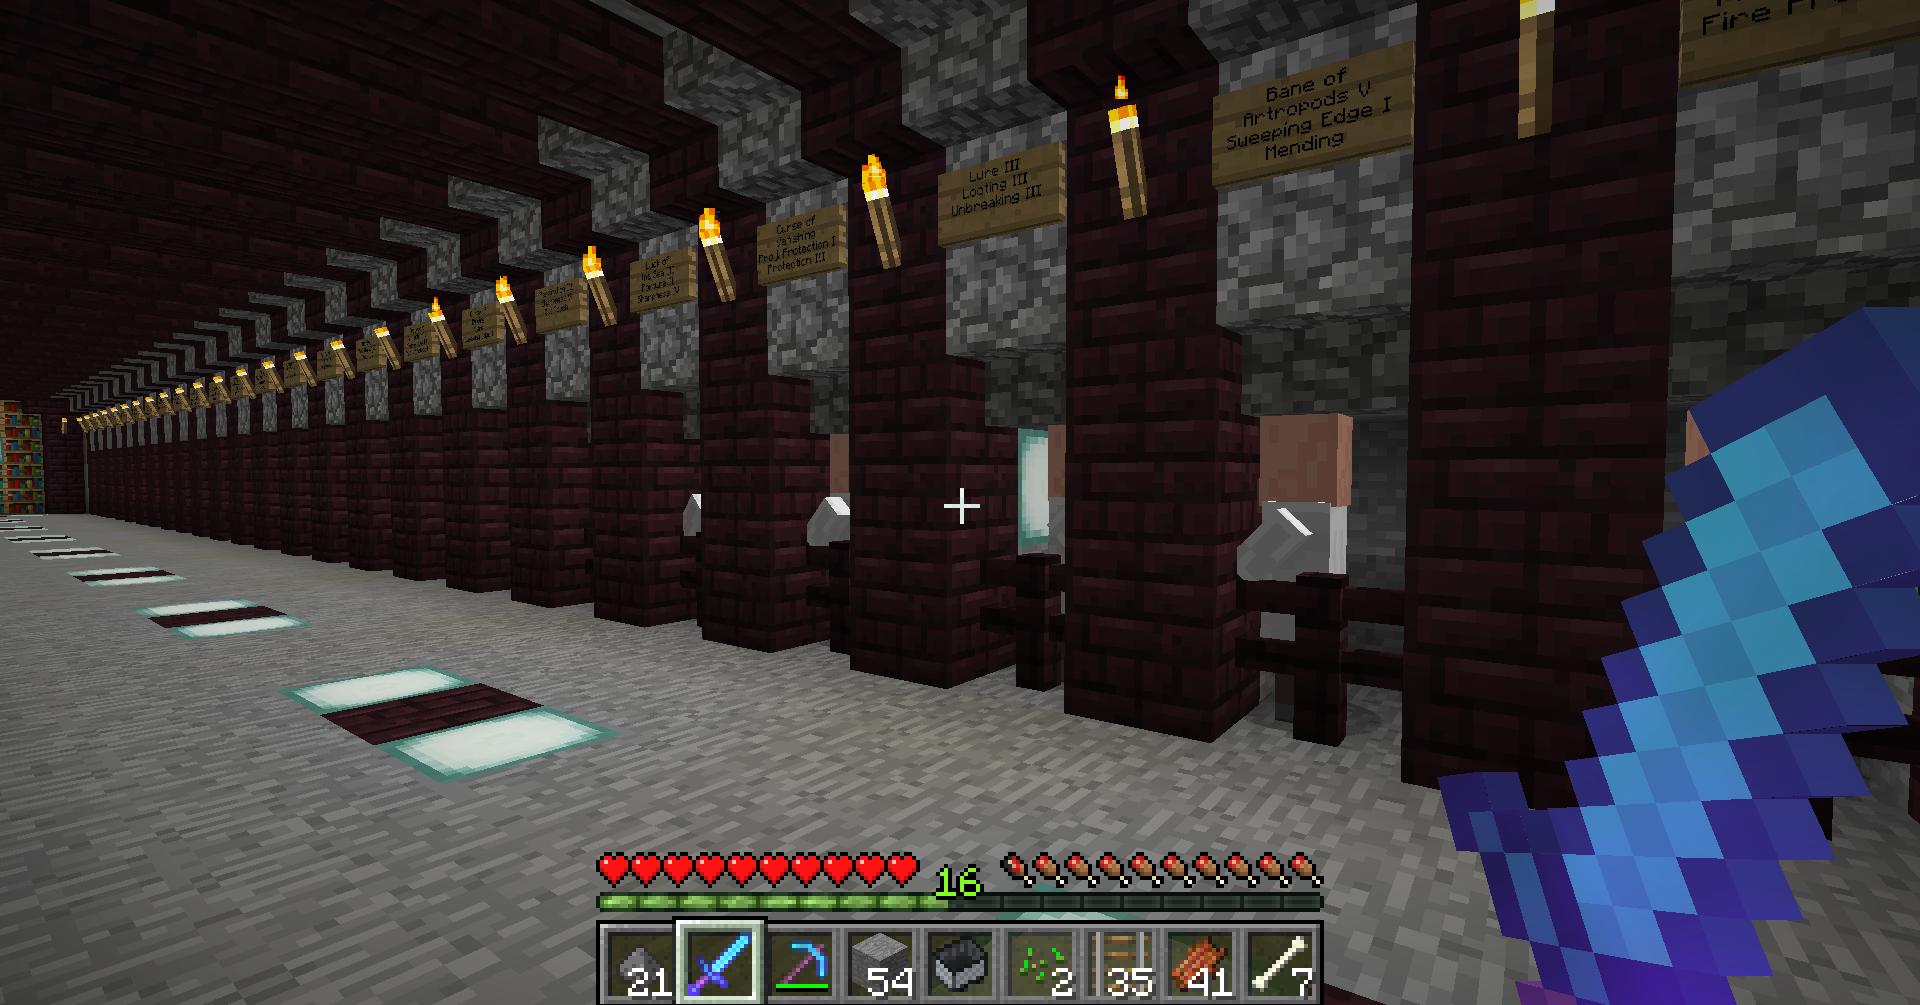 Asking everyone's input about Blacksmith armorer villager